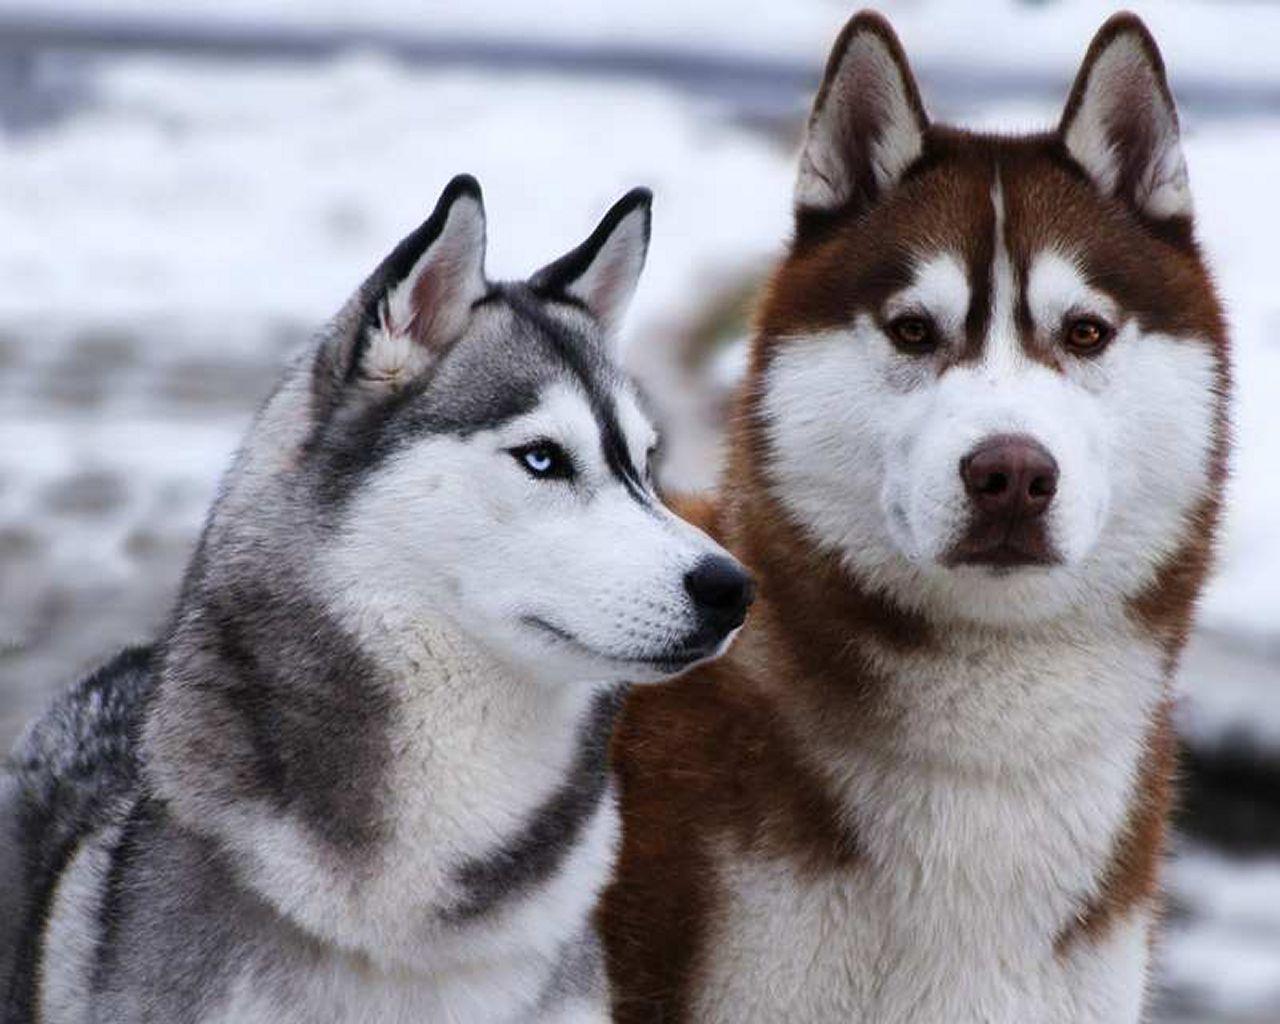 Siberian Husky Outgoing And Cheeky Canadian Eskimo Dog Husky Dogs Siberian Husky